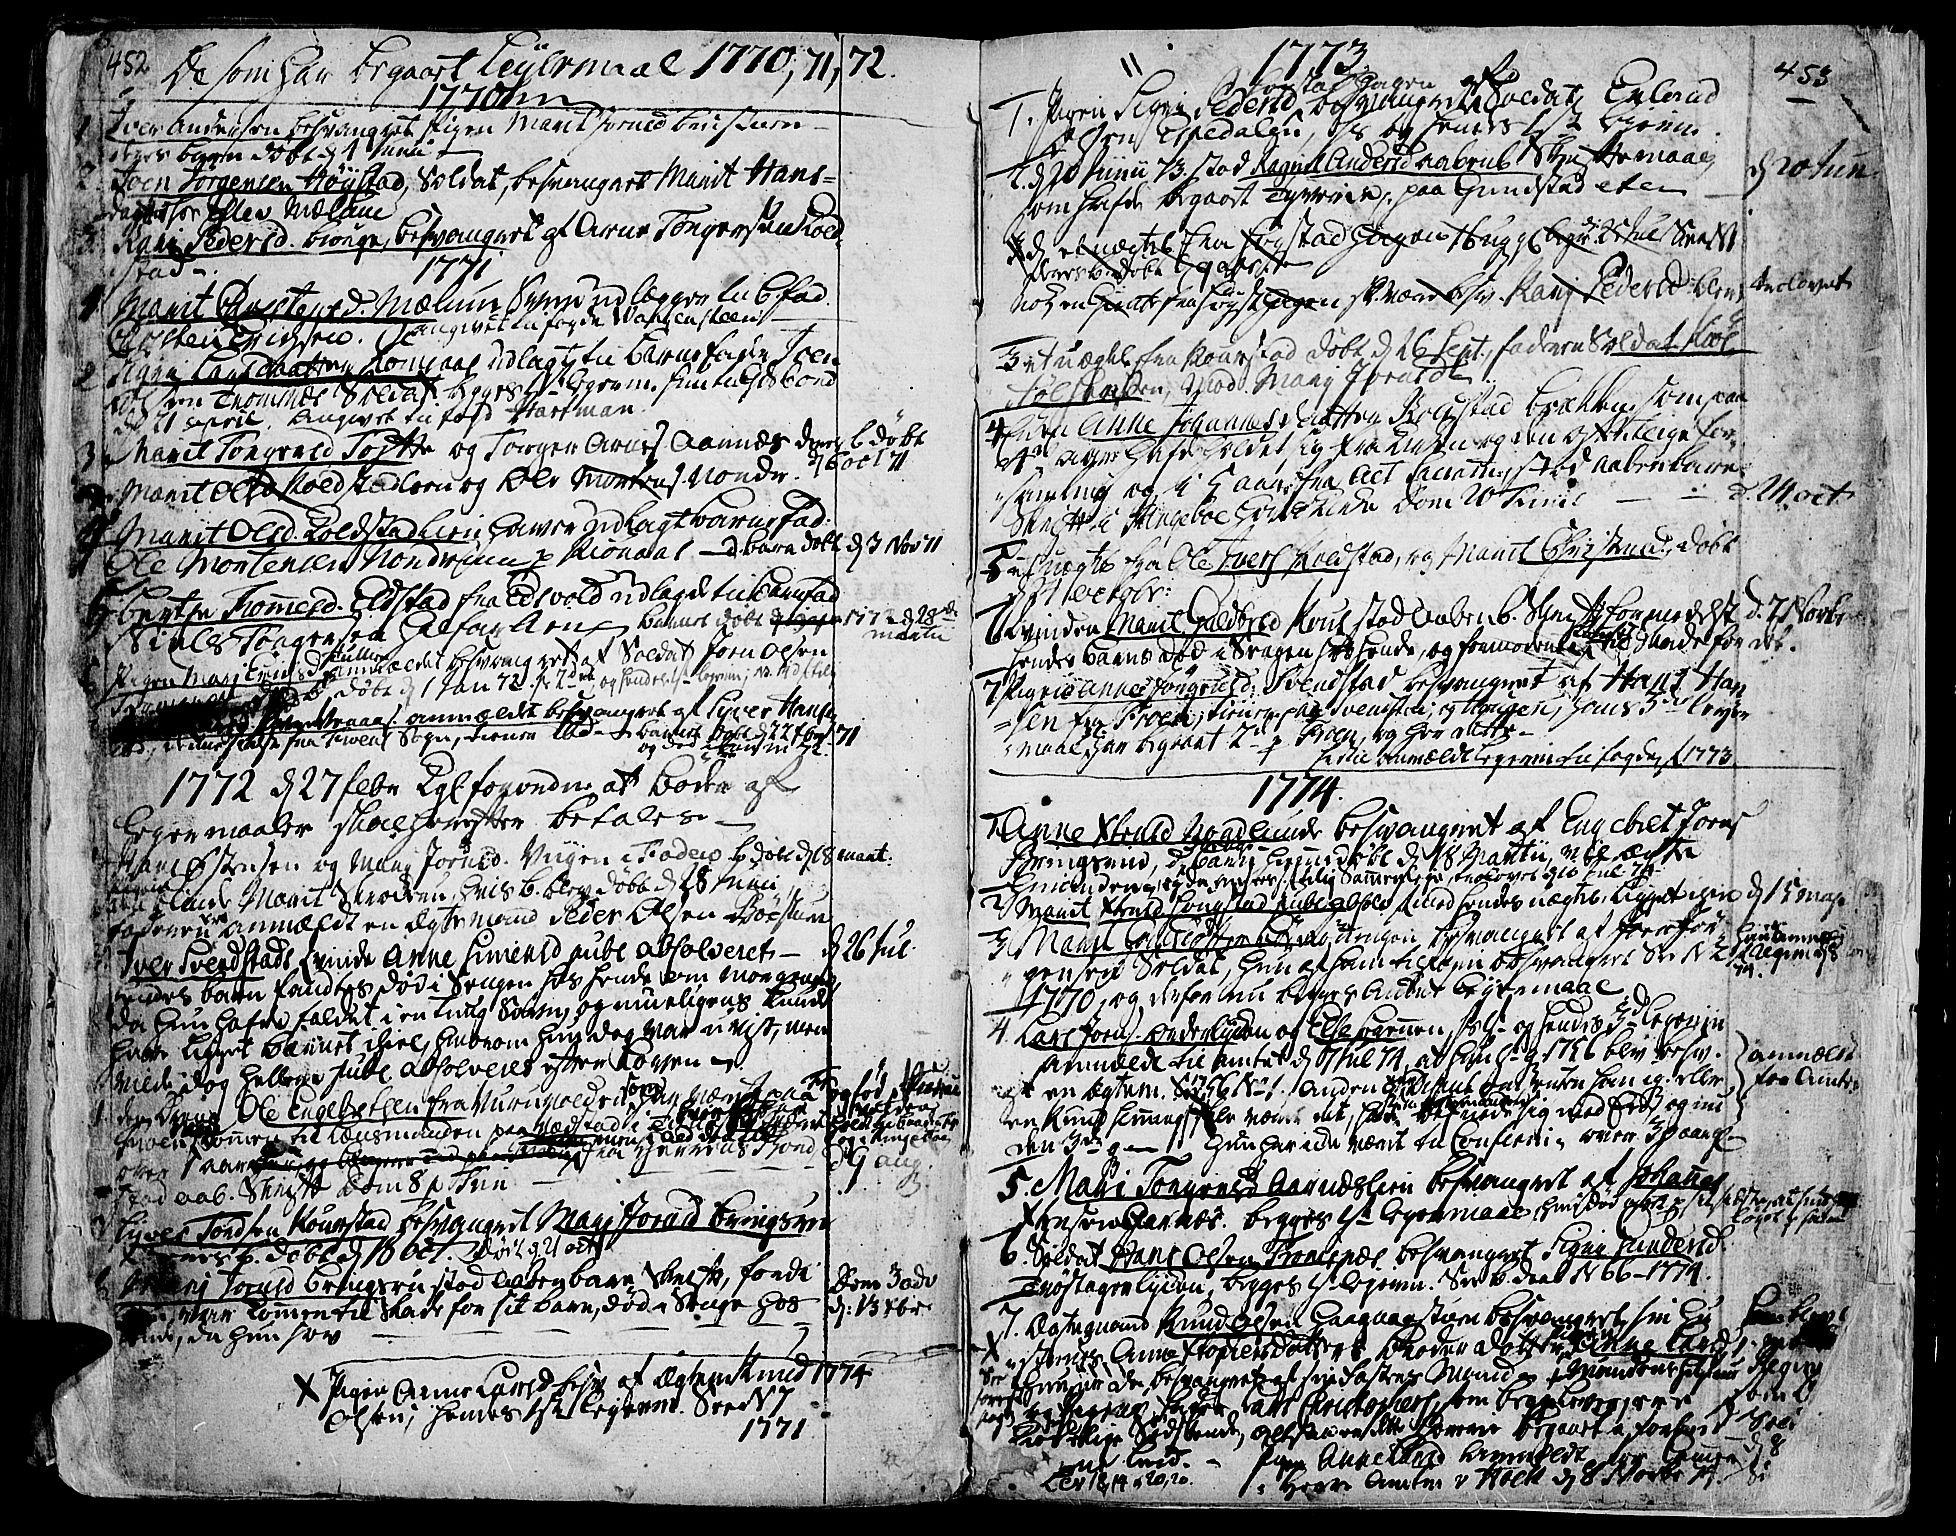 SAH, Ringebu prestekontor, Ministerialbok nr. 2, 1734-1780, s. 452-453